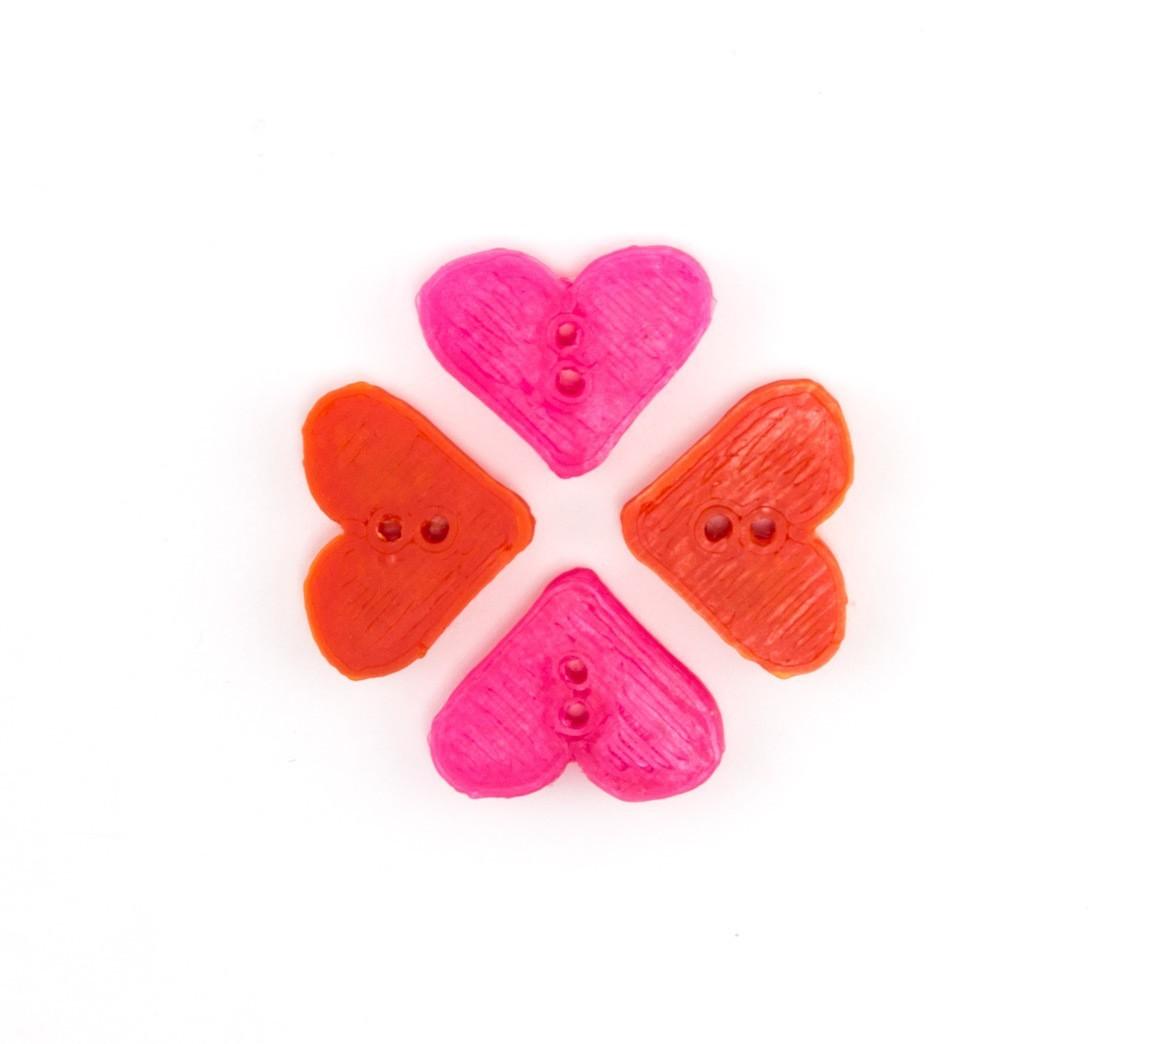 bb6300db2fb6eb38b8aff62727aaab1a_1443207077295_NMD000113-153_@2x.jpg Download free STL file Heart Button • 3D printable design, Lucy_Haribert